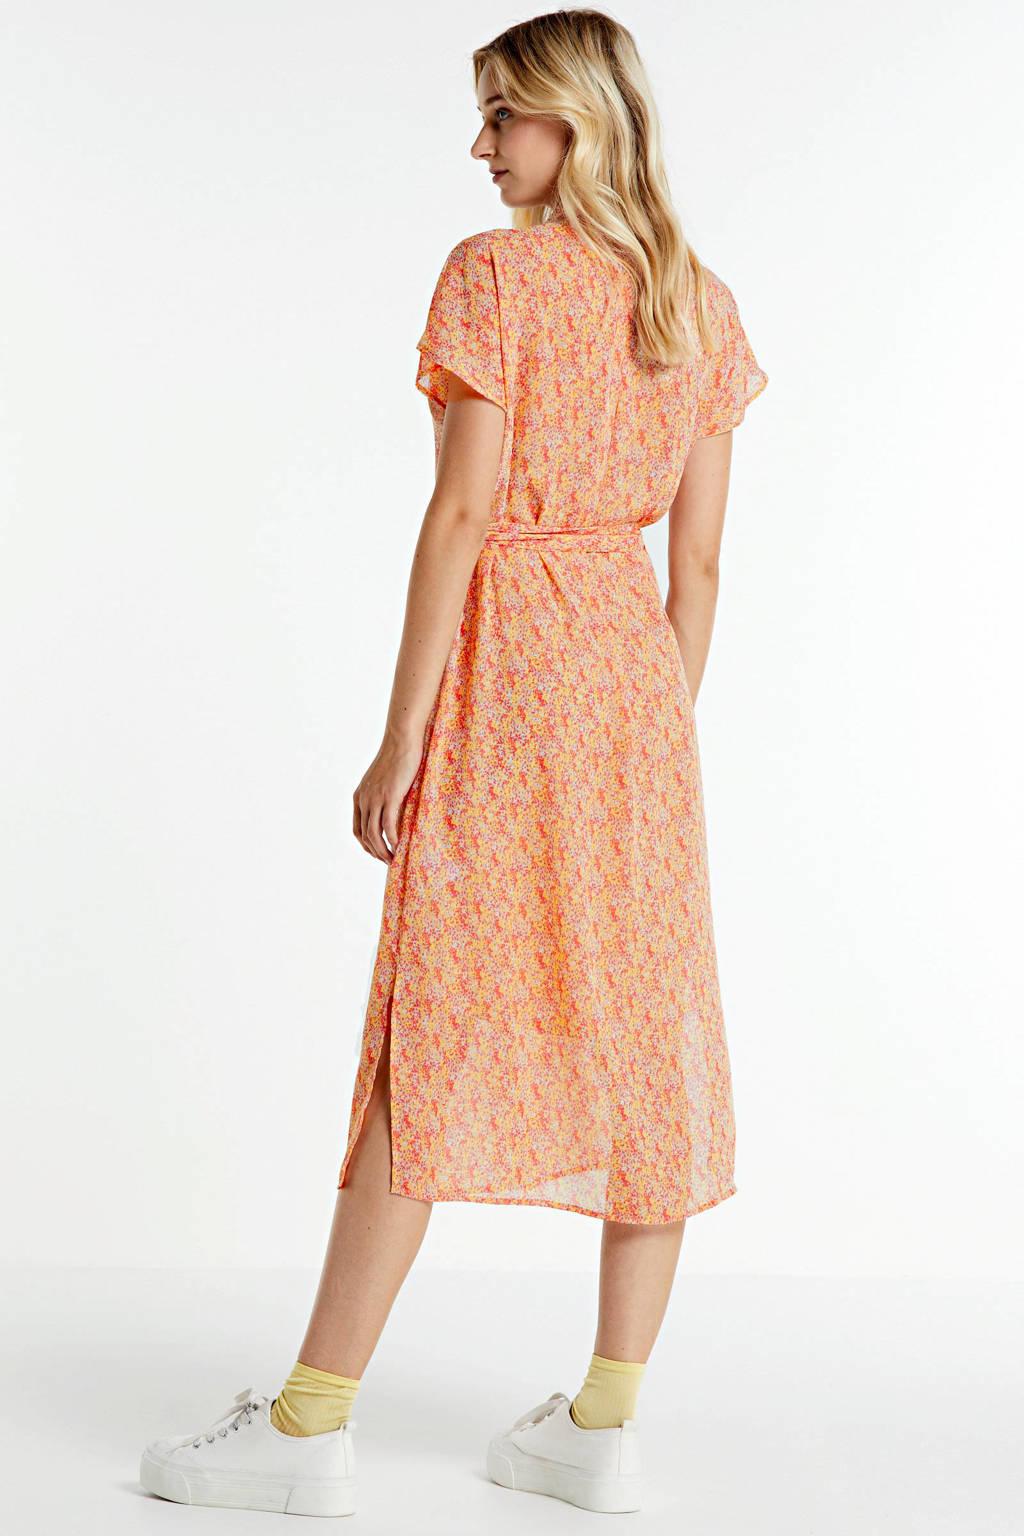 Saint Tropez gebloemde semi-transparante jurk, Beige/multi